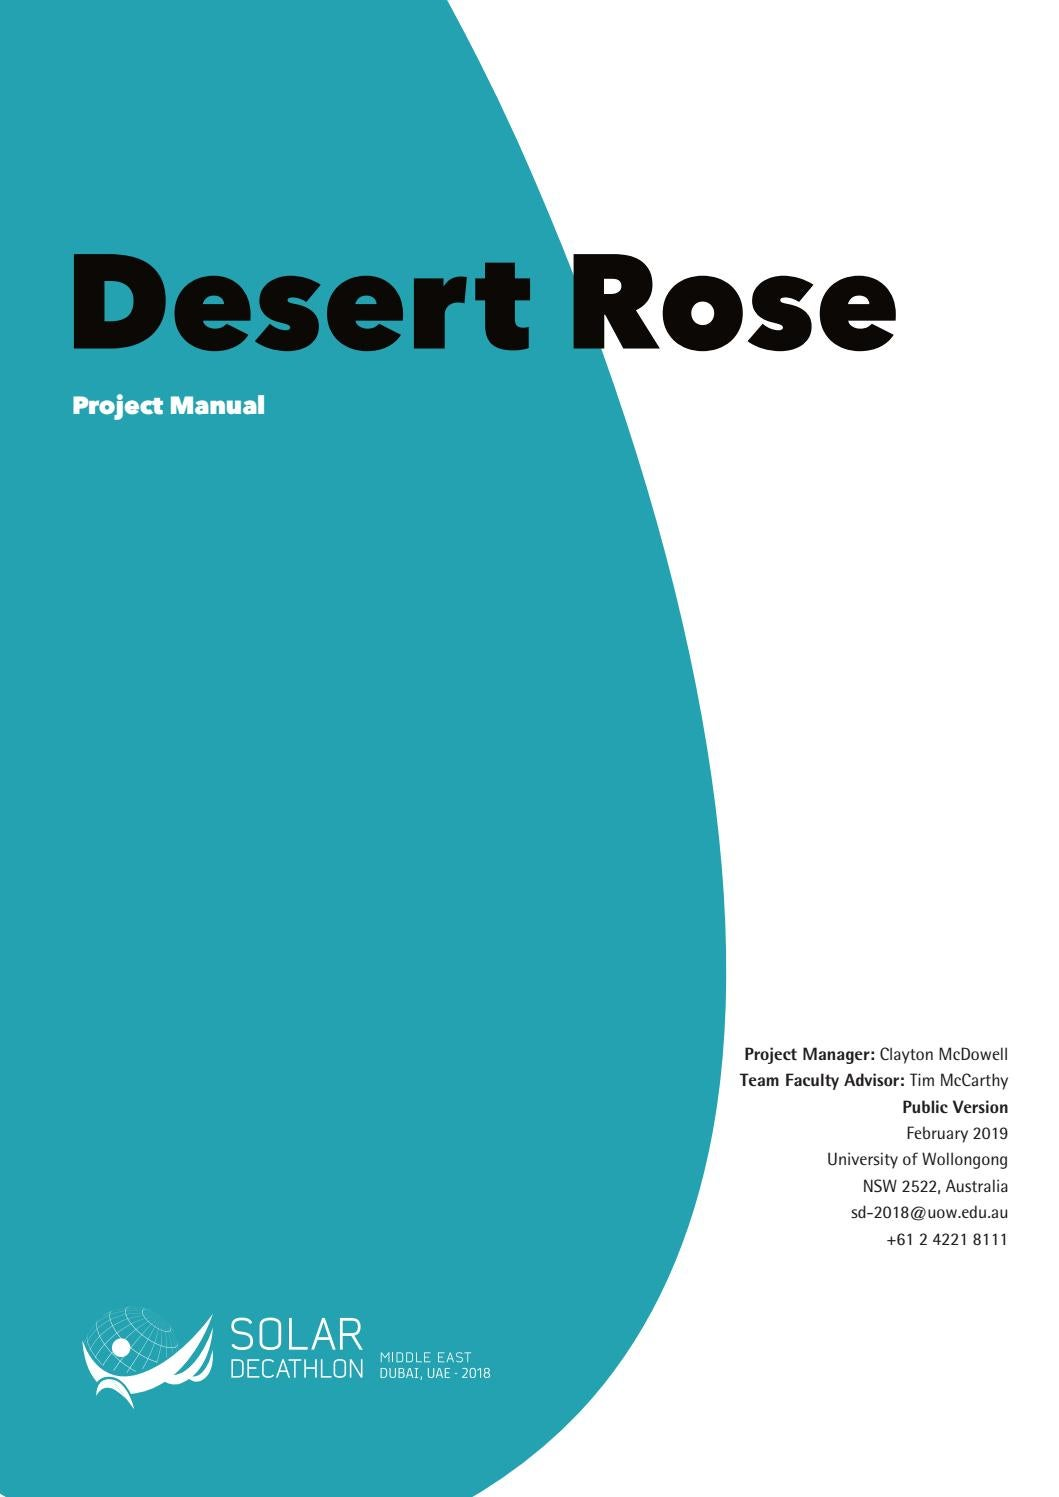 5754f9962c3a Team UOW Australia-Dubai  Desert Rose Project Manual by desertrosehouse -  issuu